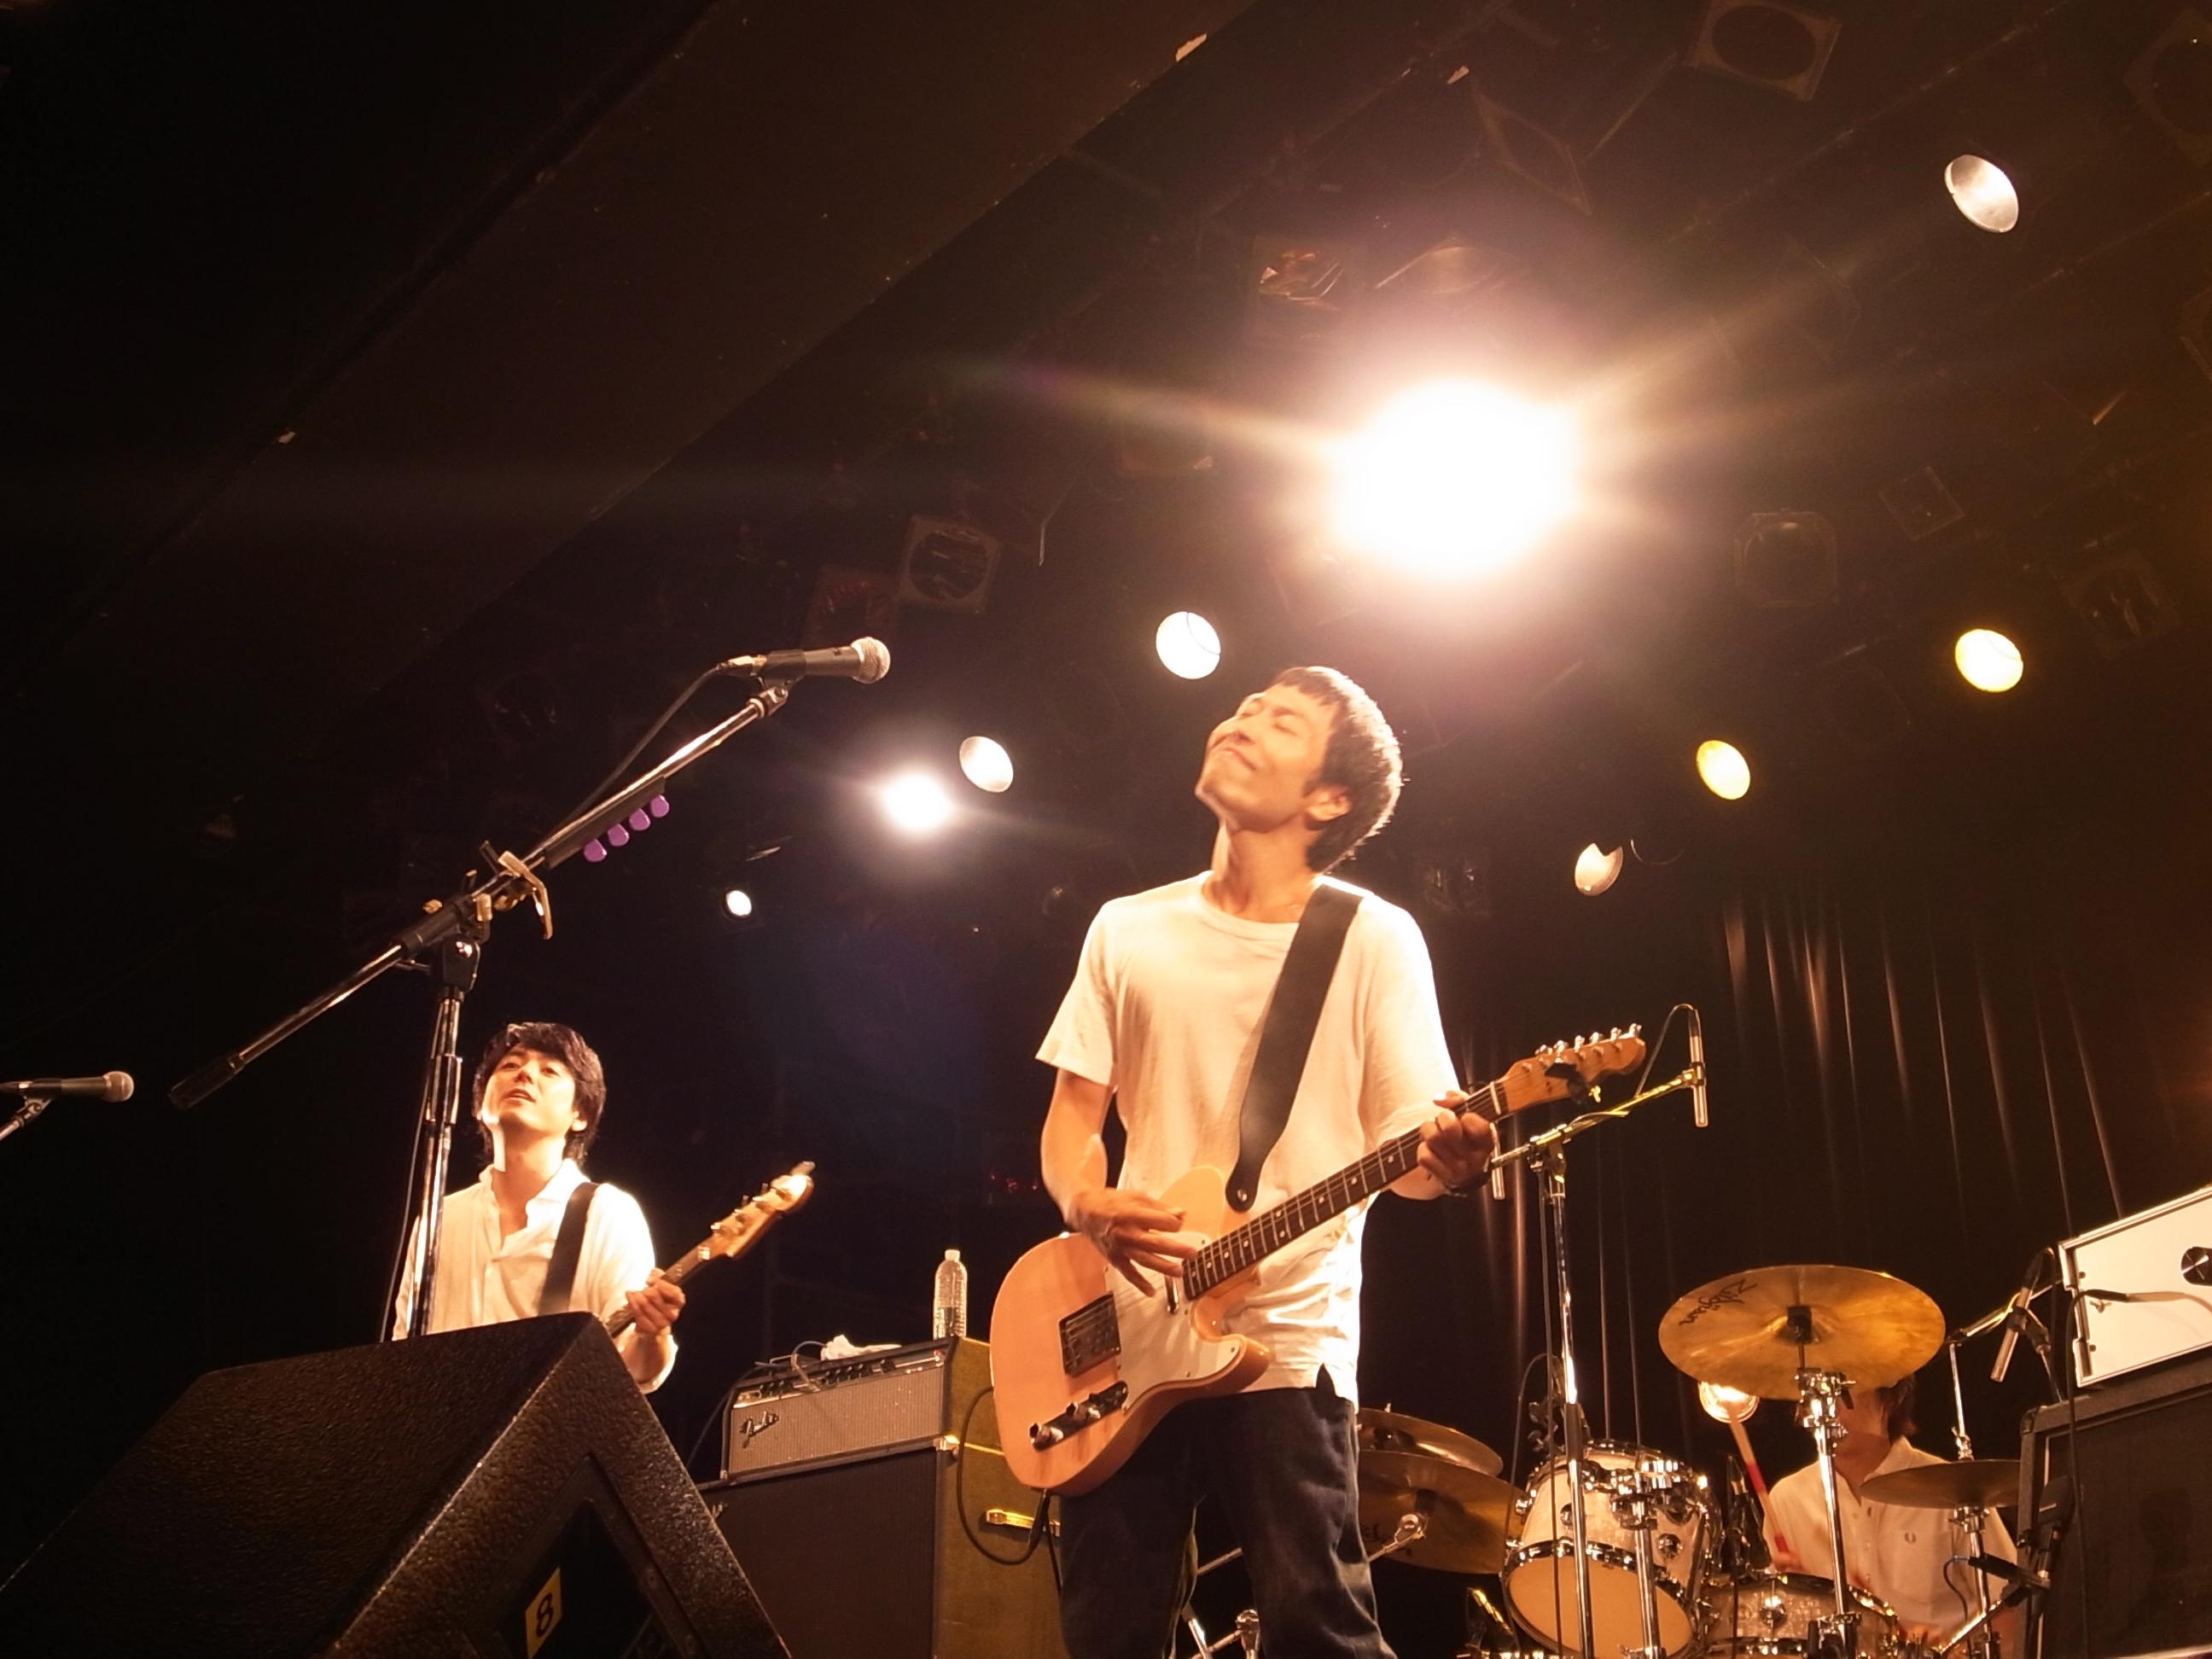 http://rose-records.jp/files/R0023739.JPG